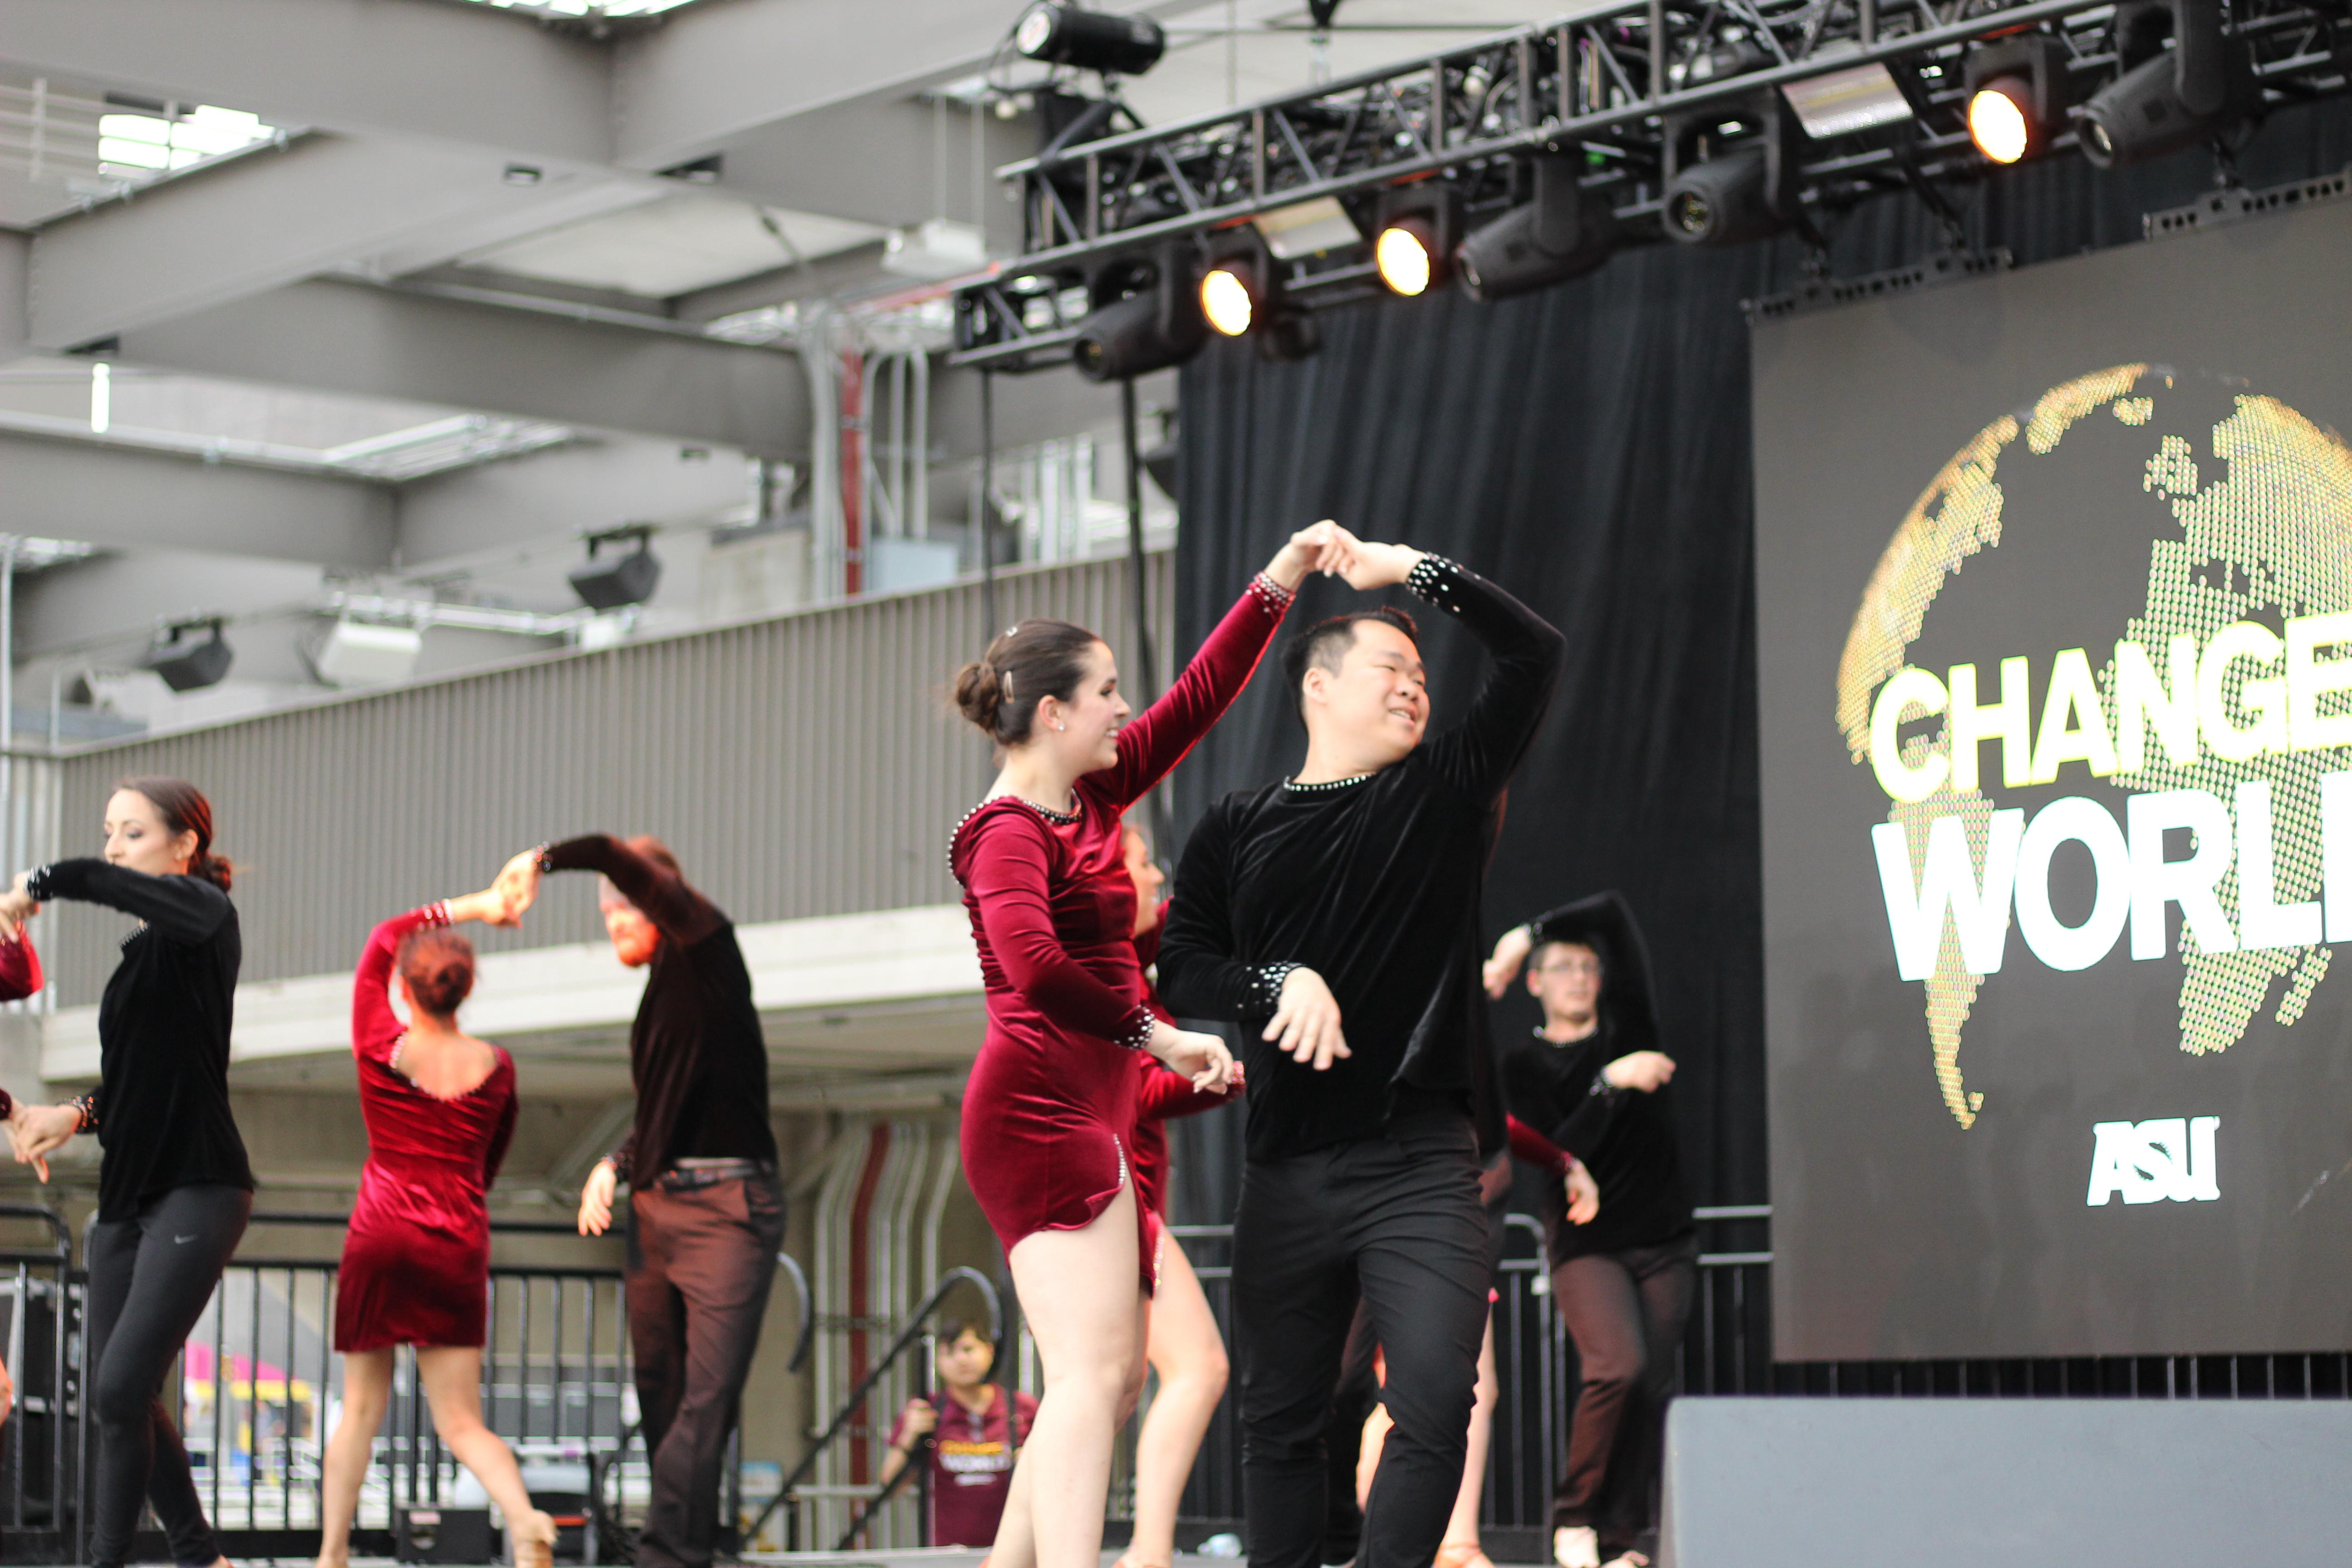 ASU Latin Sol dance group